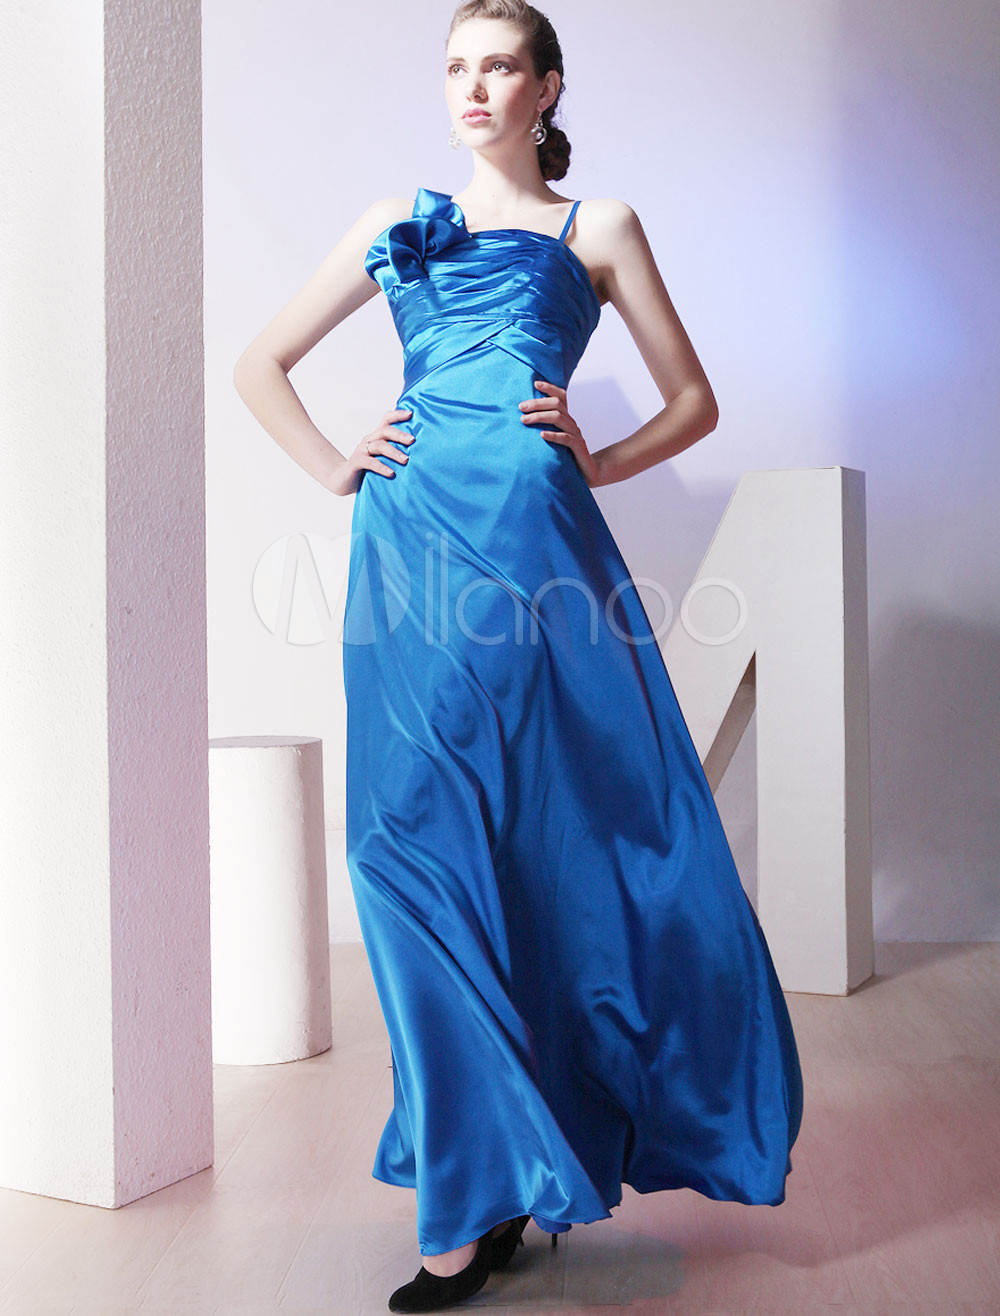 Blue Wedding Dress Gallery